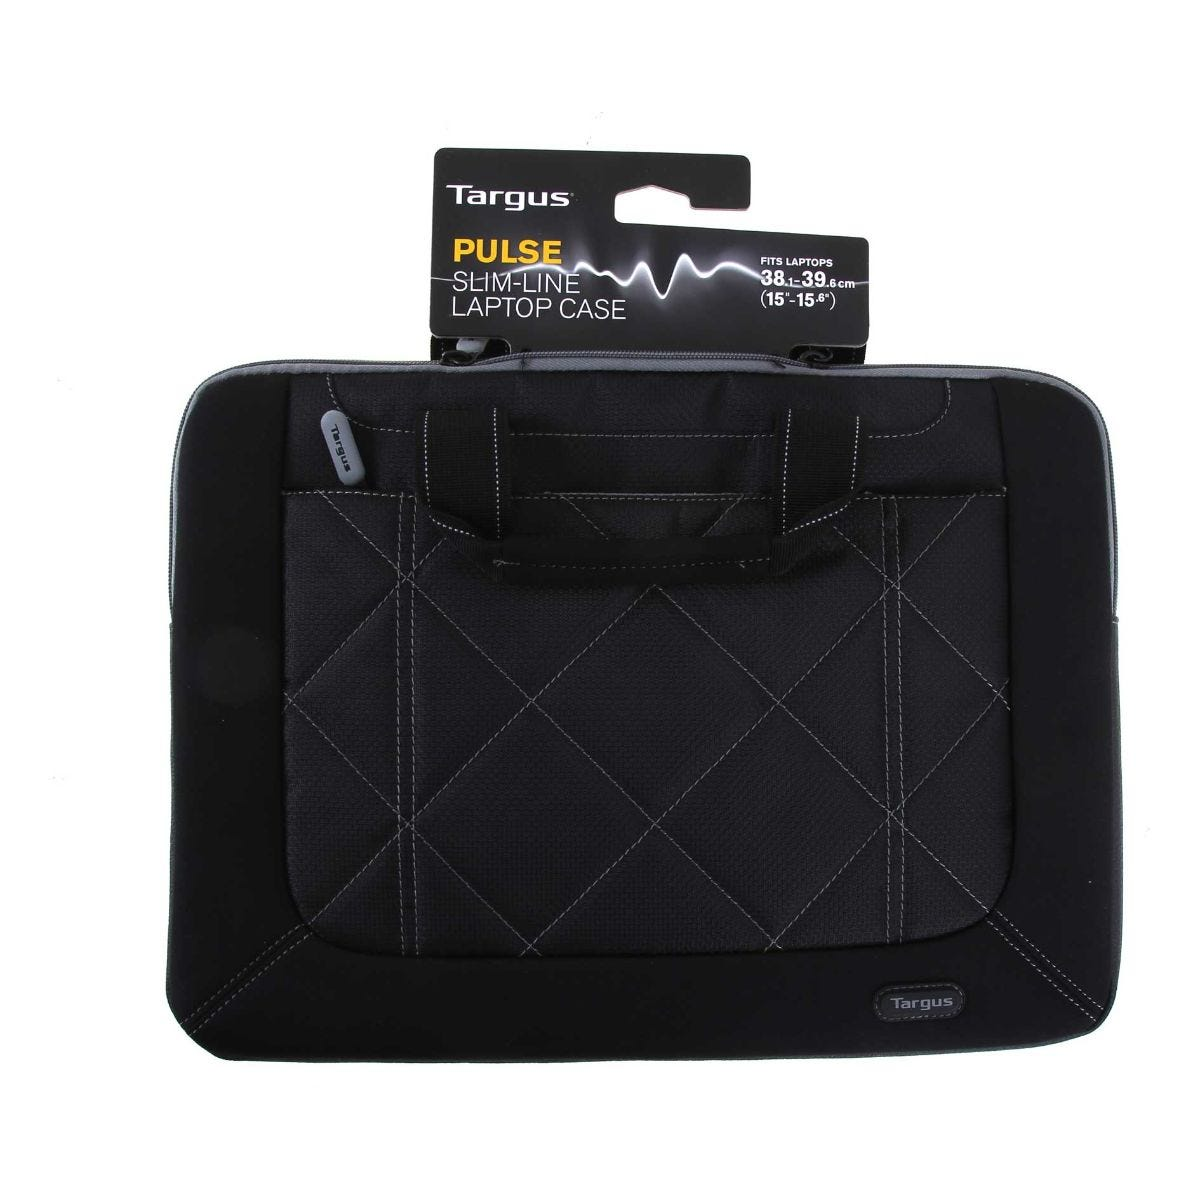 Targus Pulse Laptop Slipcase 15-16 Inch, Black / Grey.